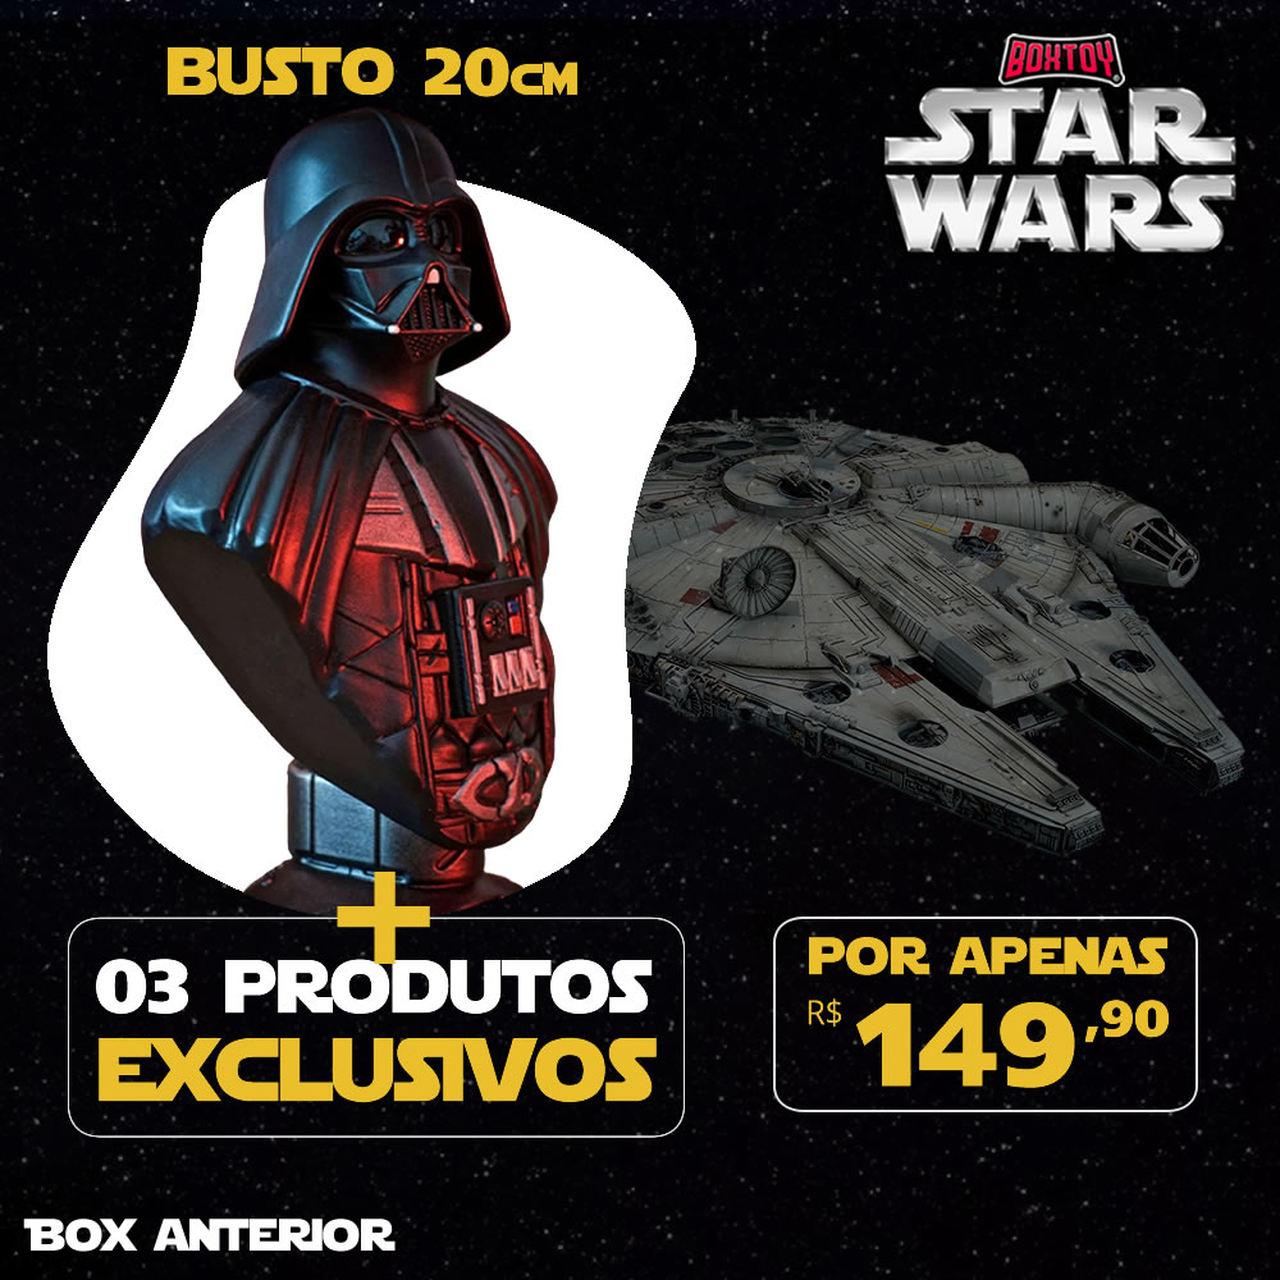 Boxtoy Edição Darth Vader - Star Wars  - Boxtoy